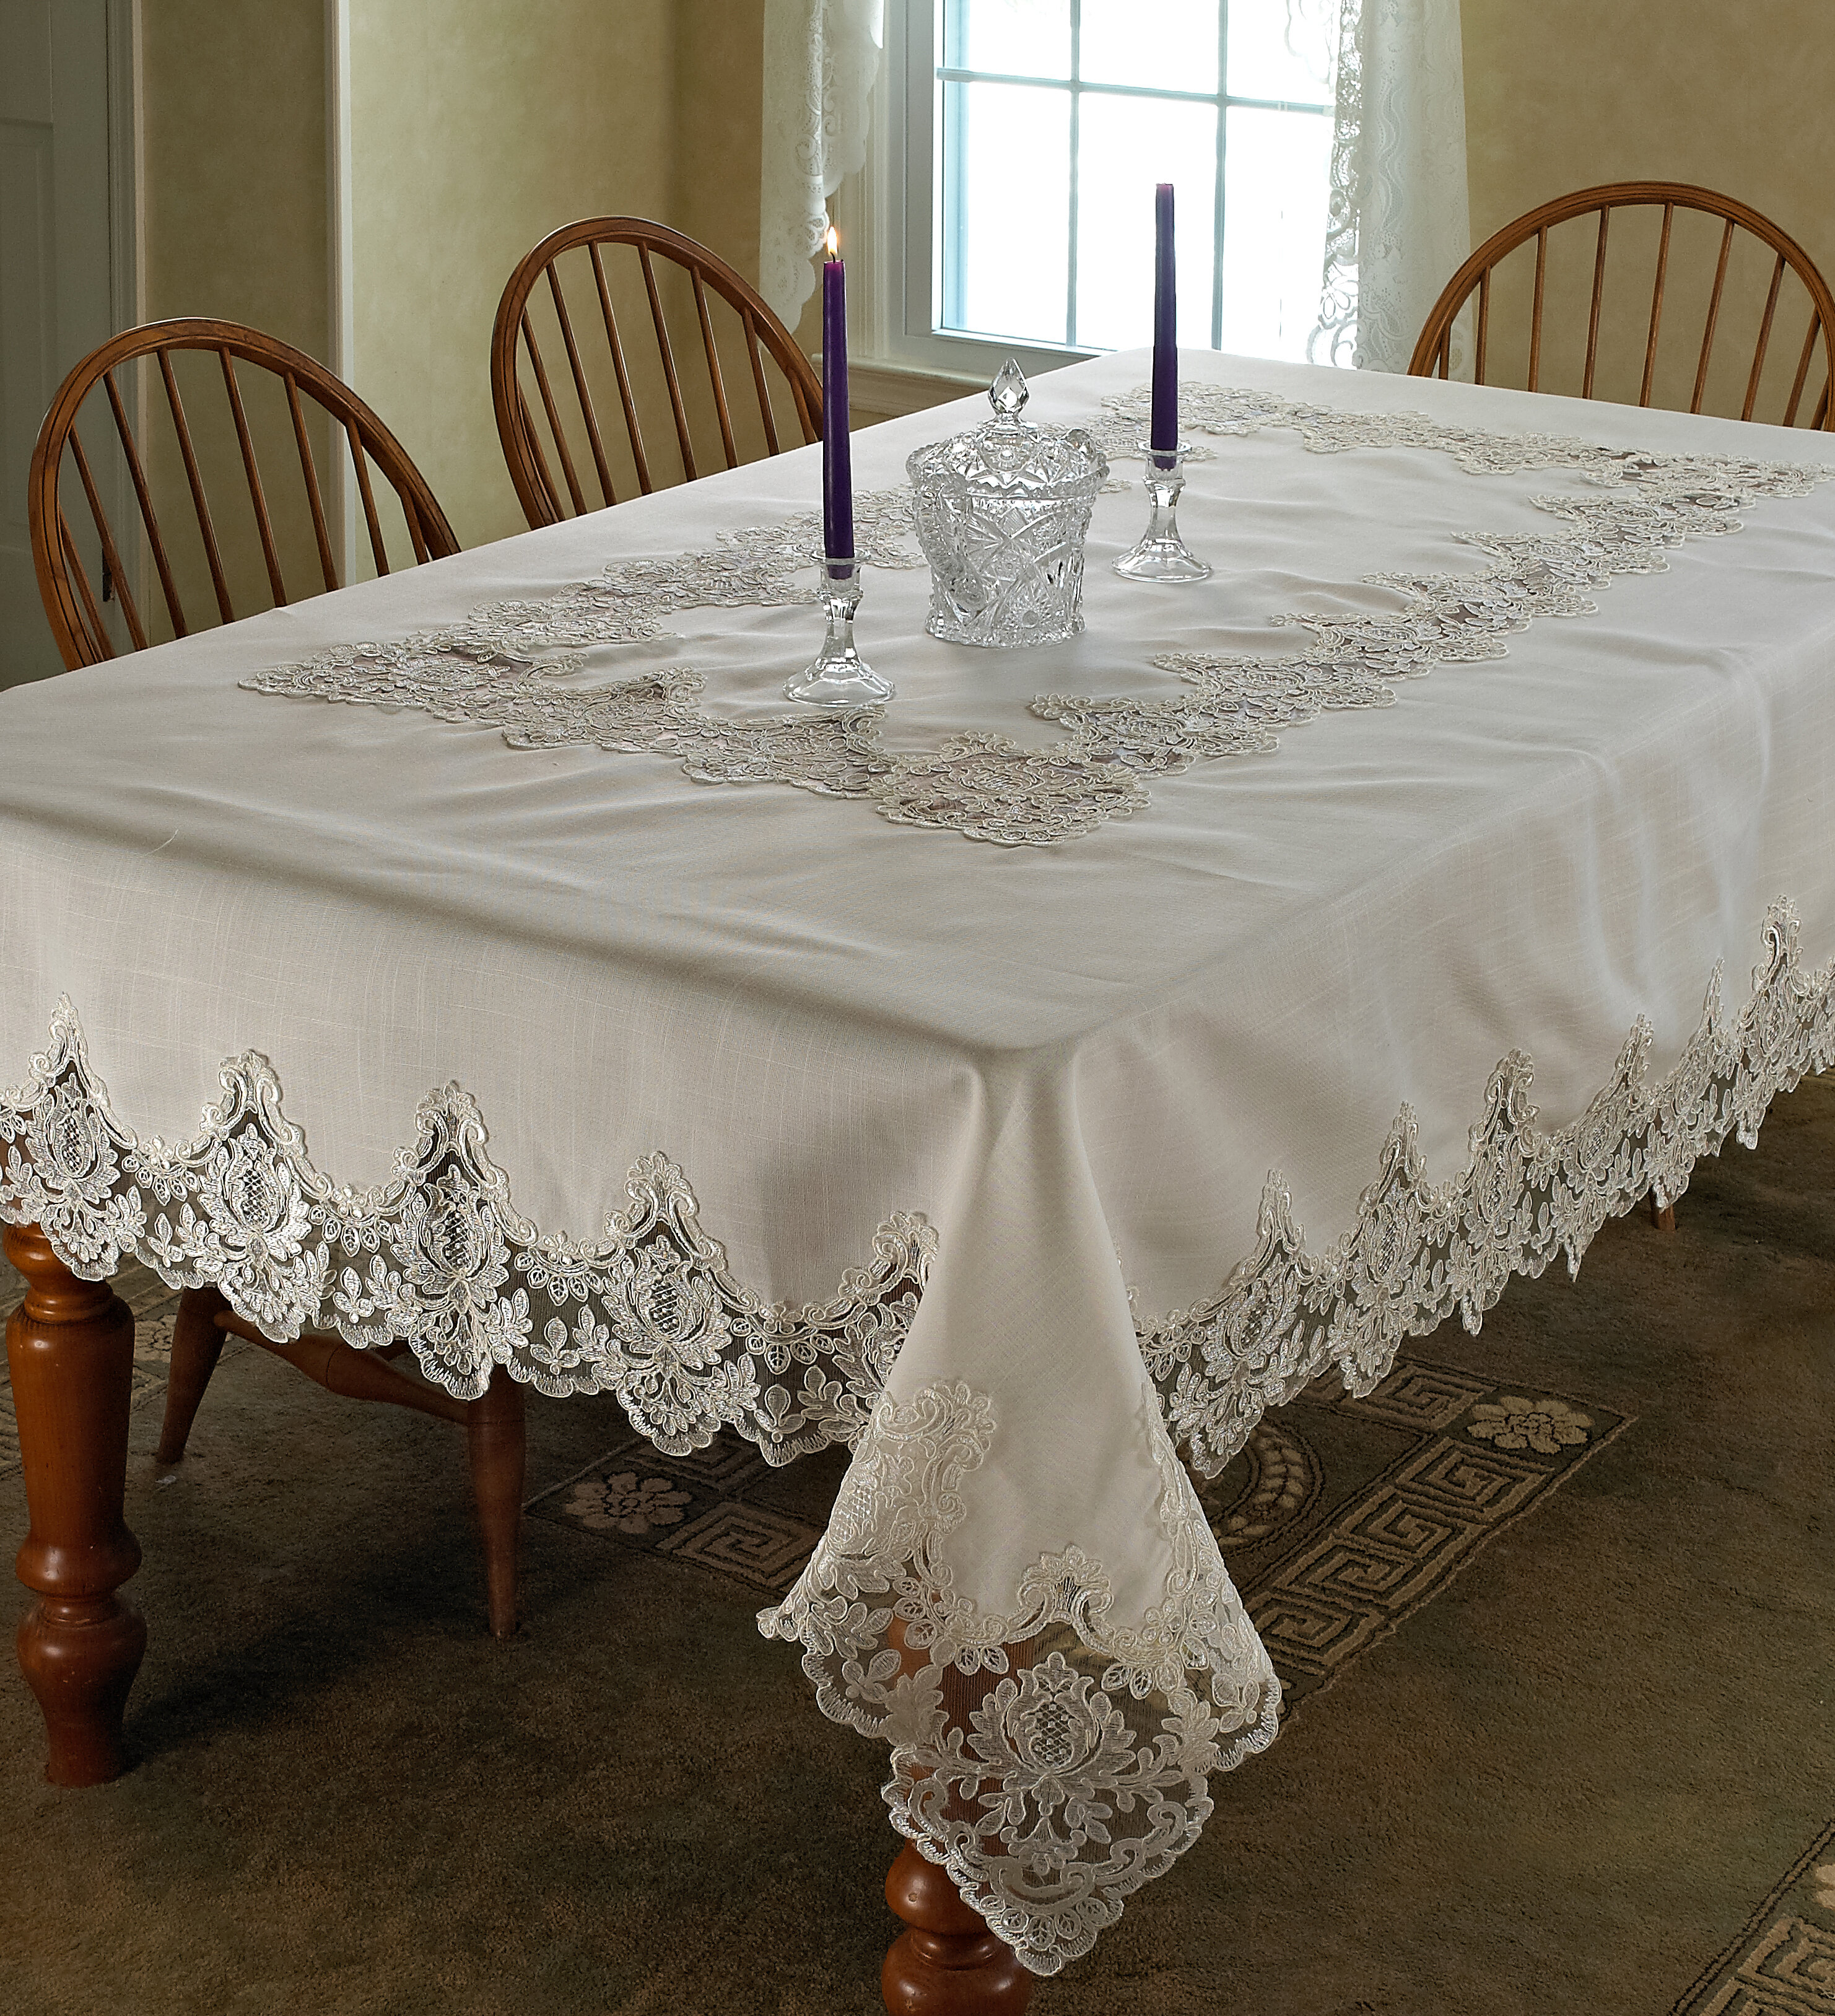 Lark Manor Gabin Vintage Lace Tablecloth Reviews Wayfair D Island Casual Wrinkle